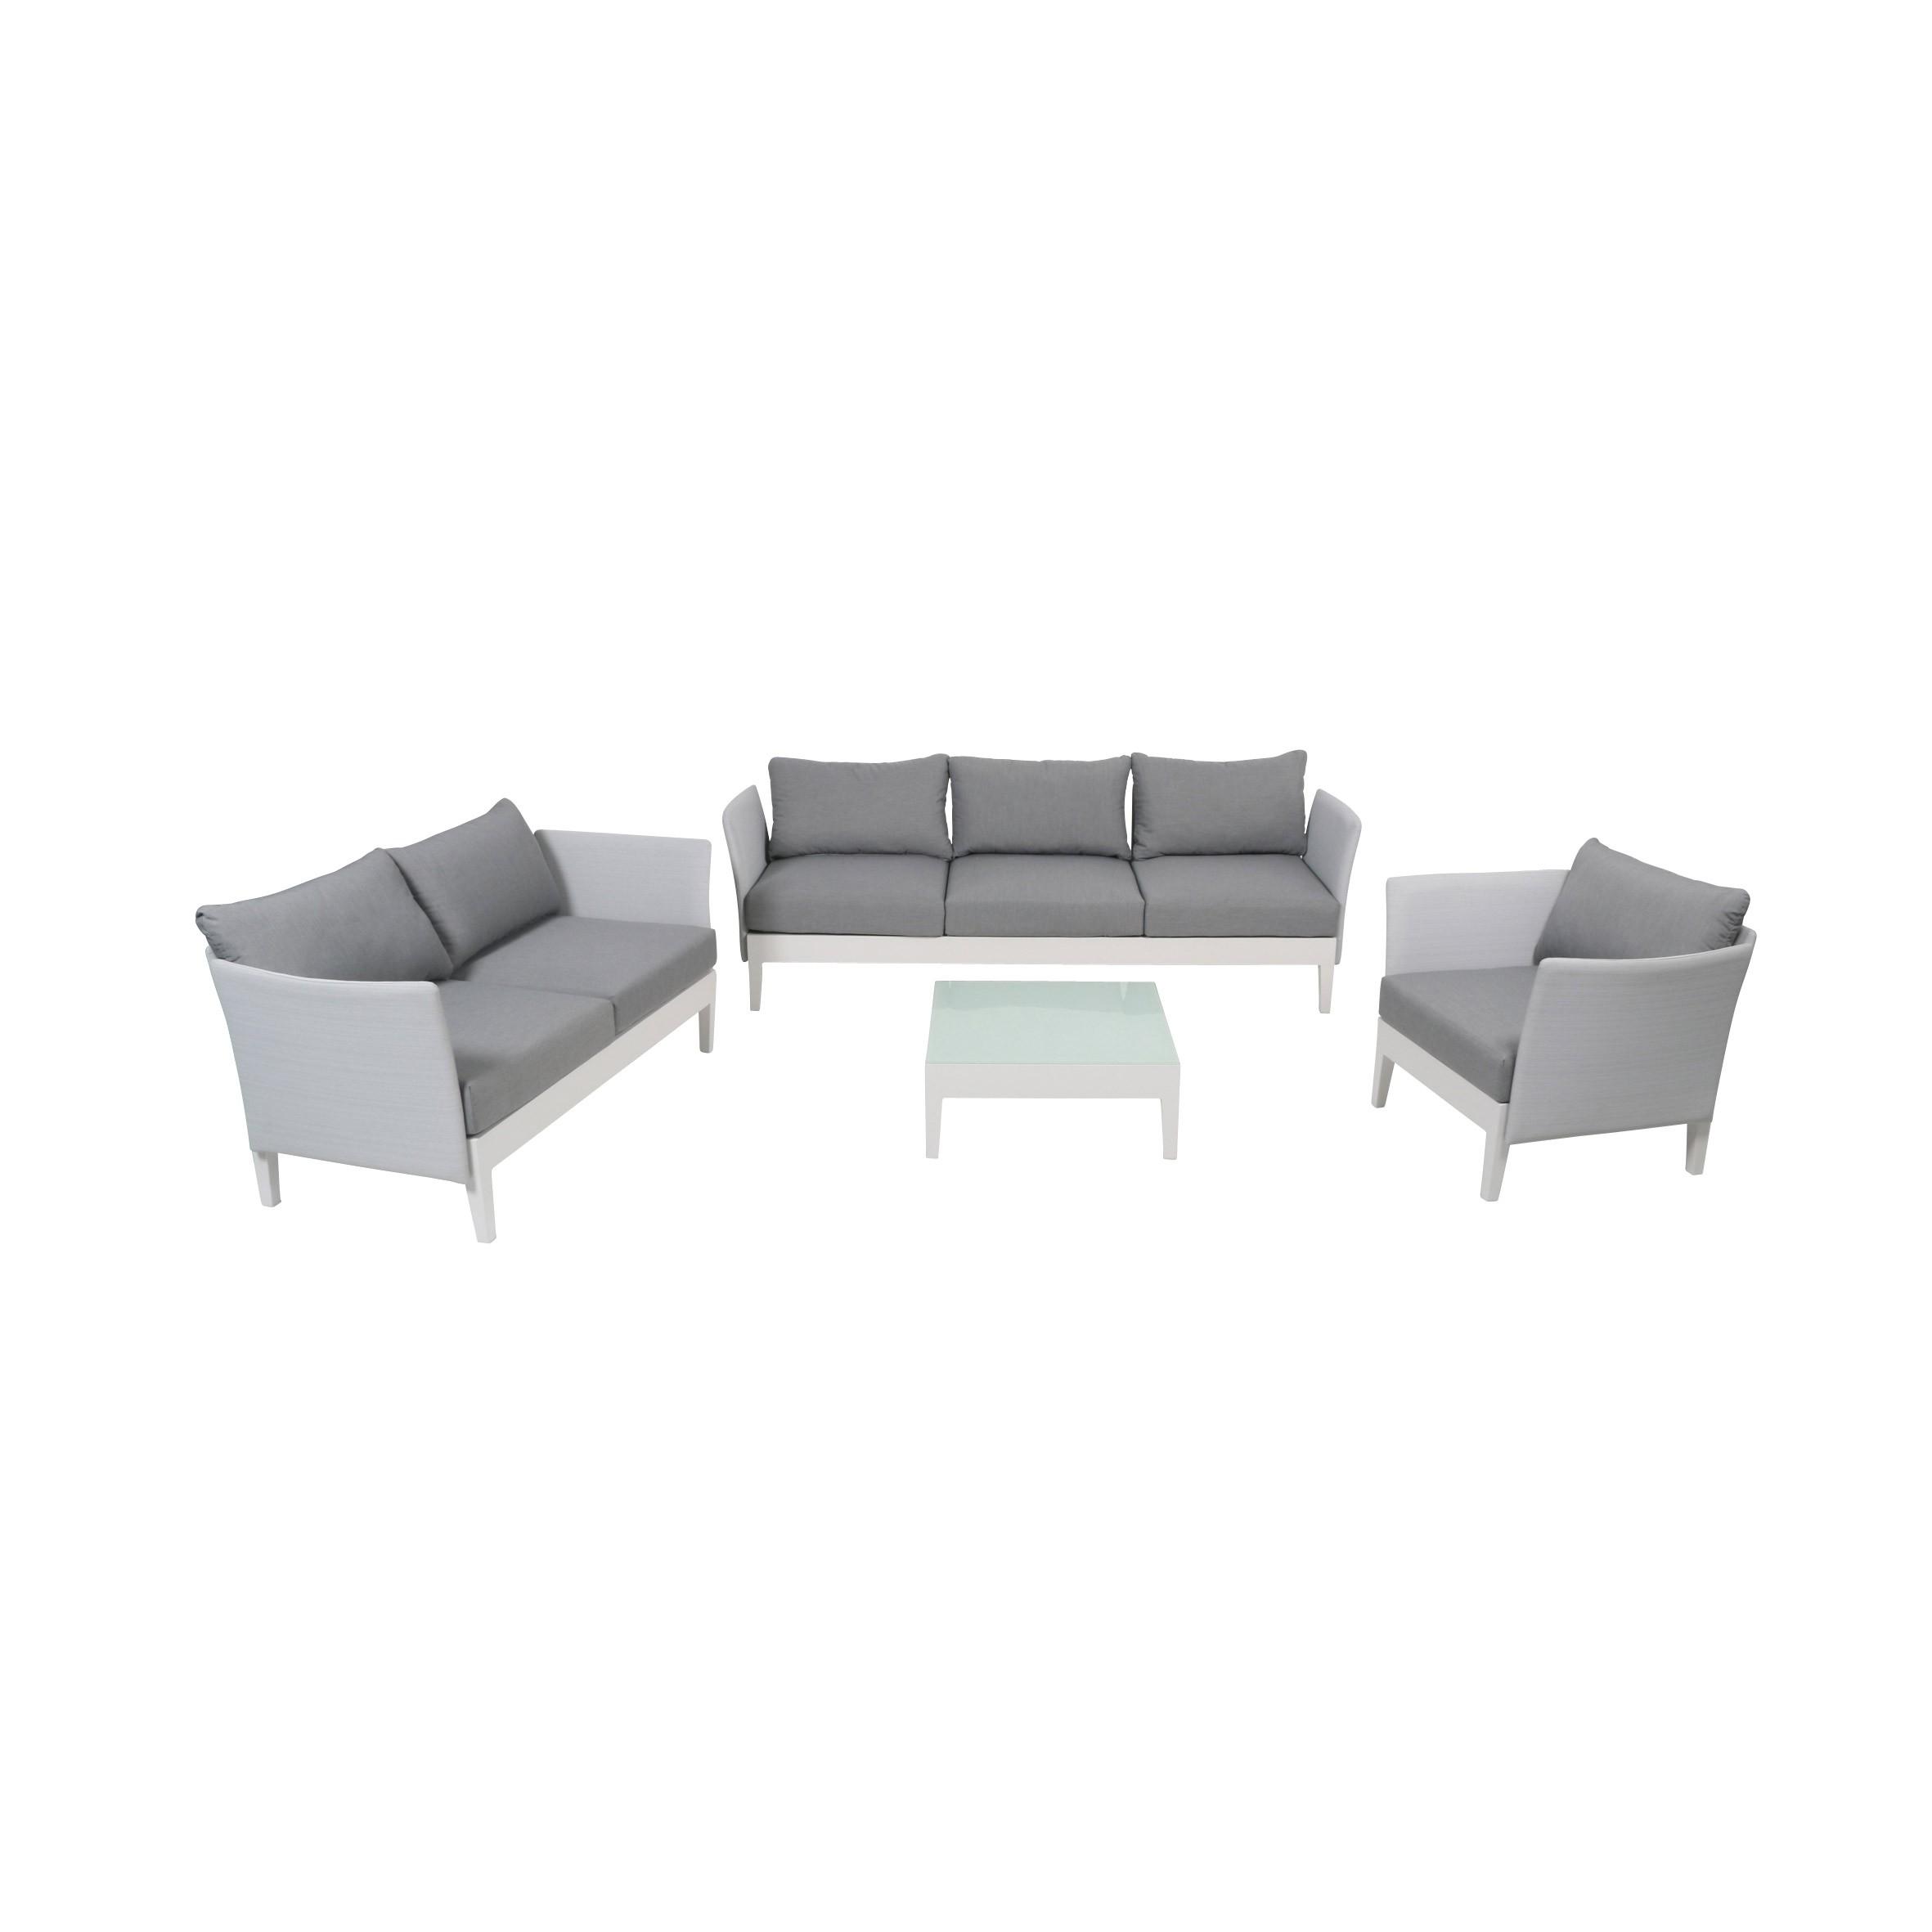 Gartenmöbel / Lounge Möbel Set Testrut Memphis Alu Textilen weiß ...